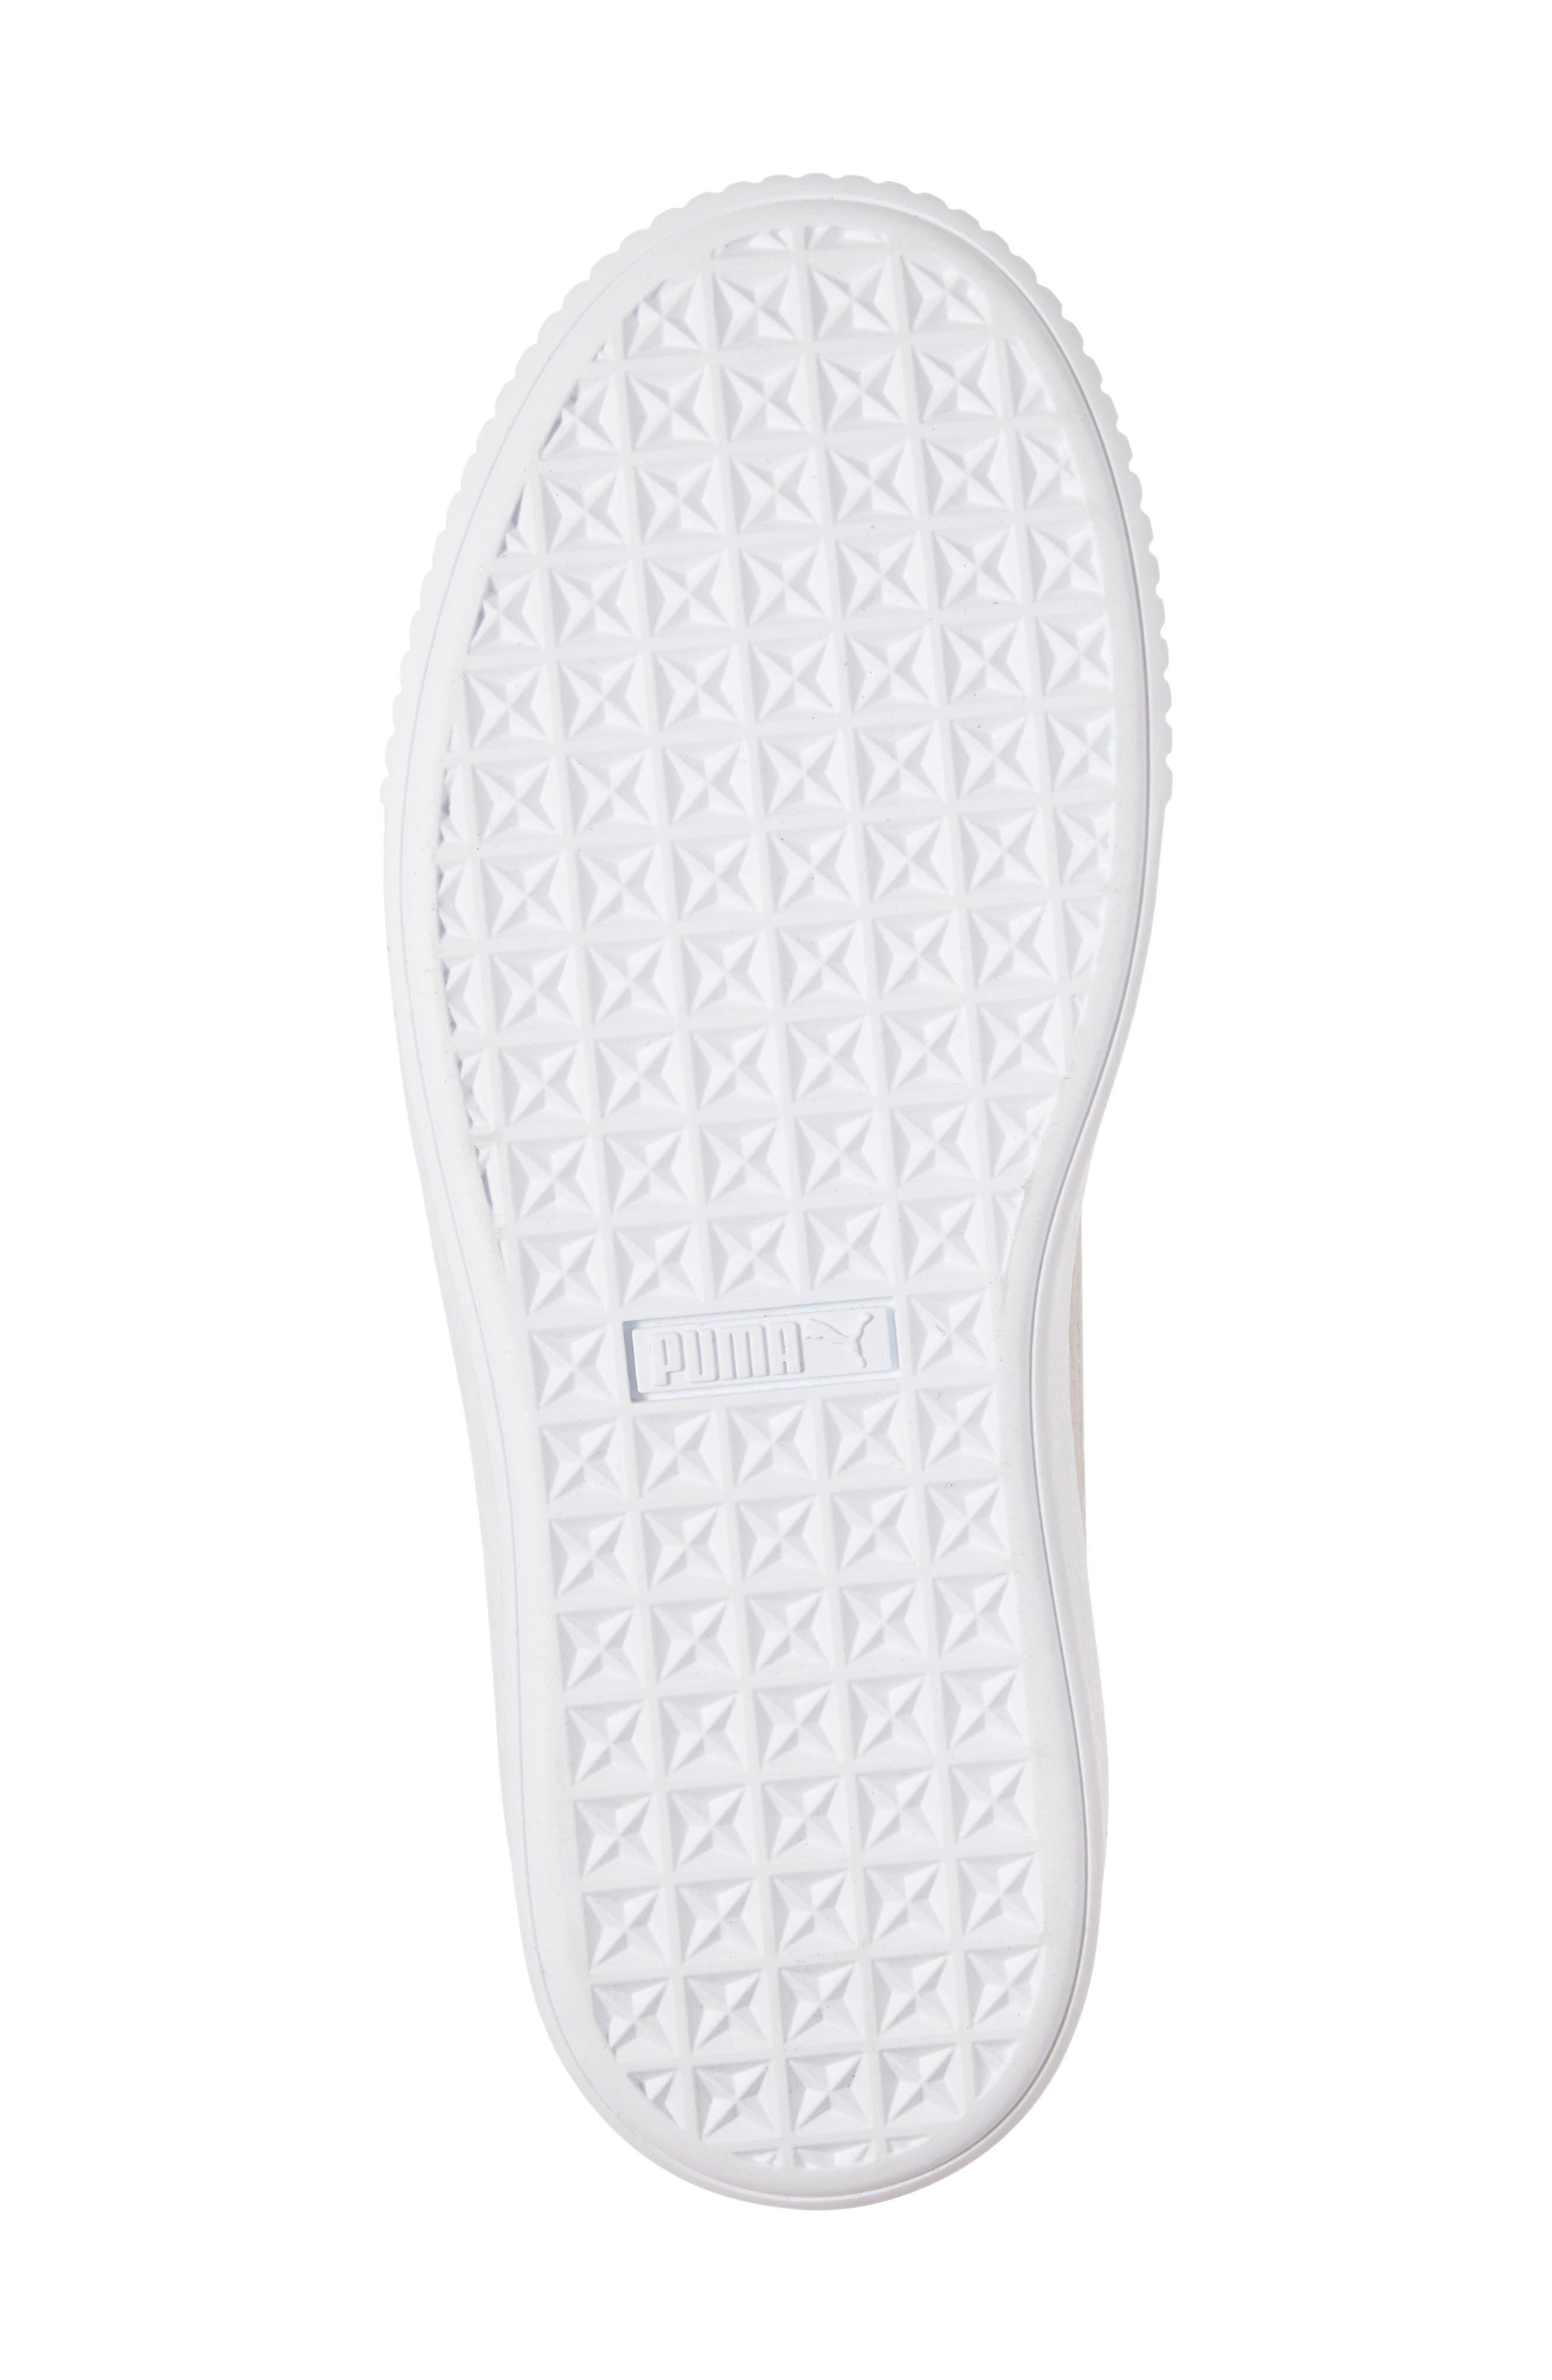 PUMA,                             Basket Platform Sneaker,                             Alternate thumbnail 6, color,                             060